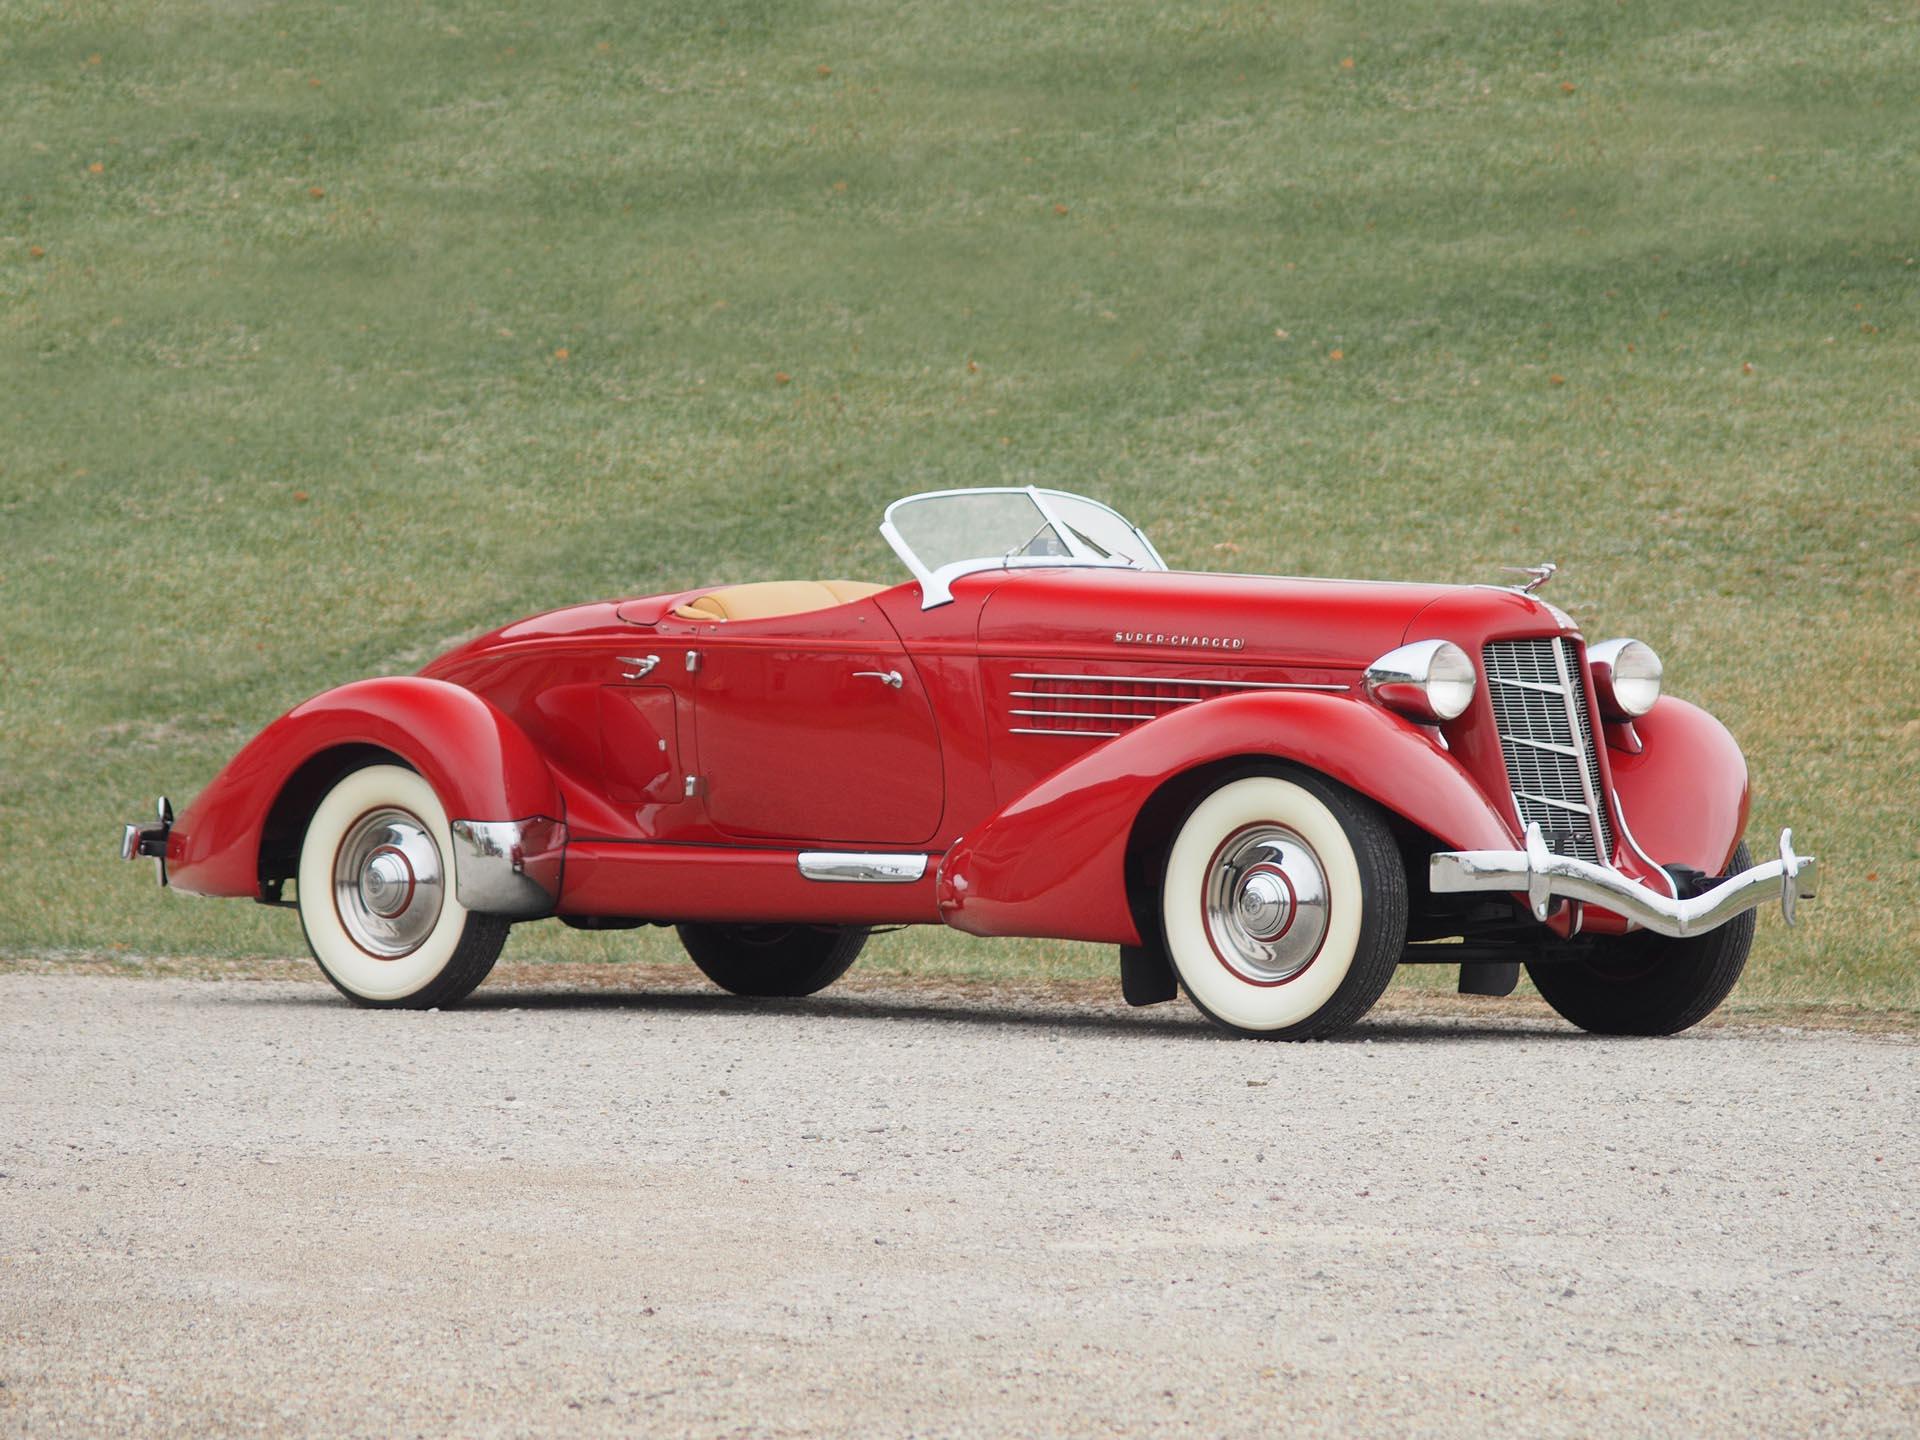 1935 Auburn 851 Supercharged Speedster red 3/4